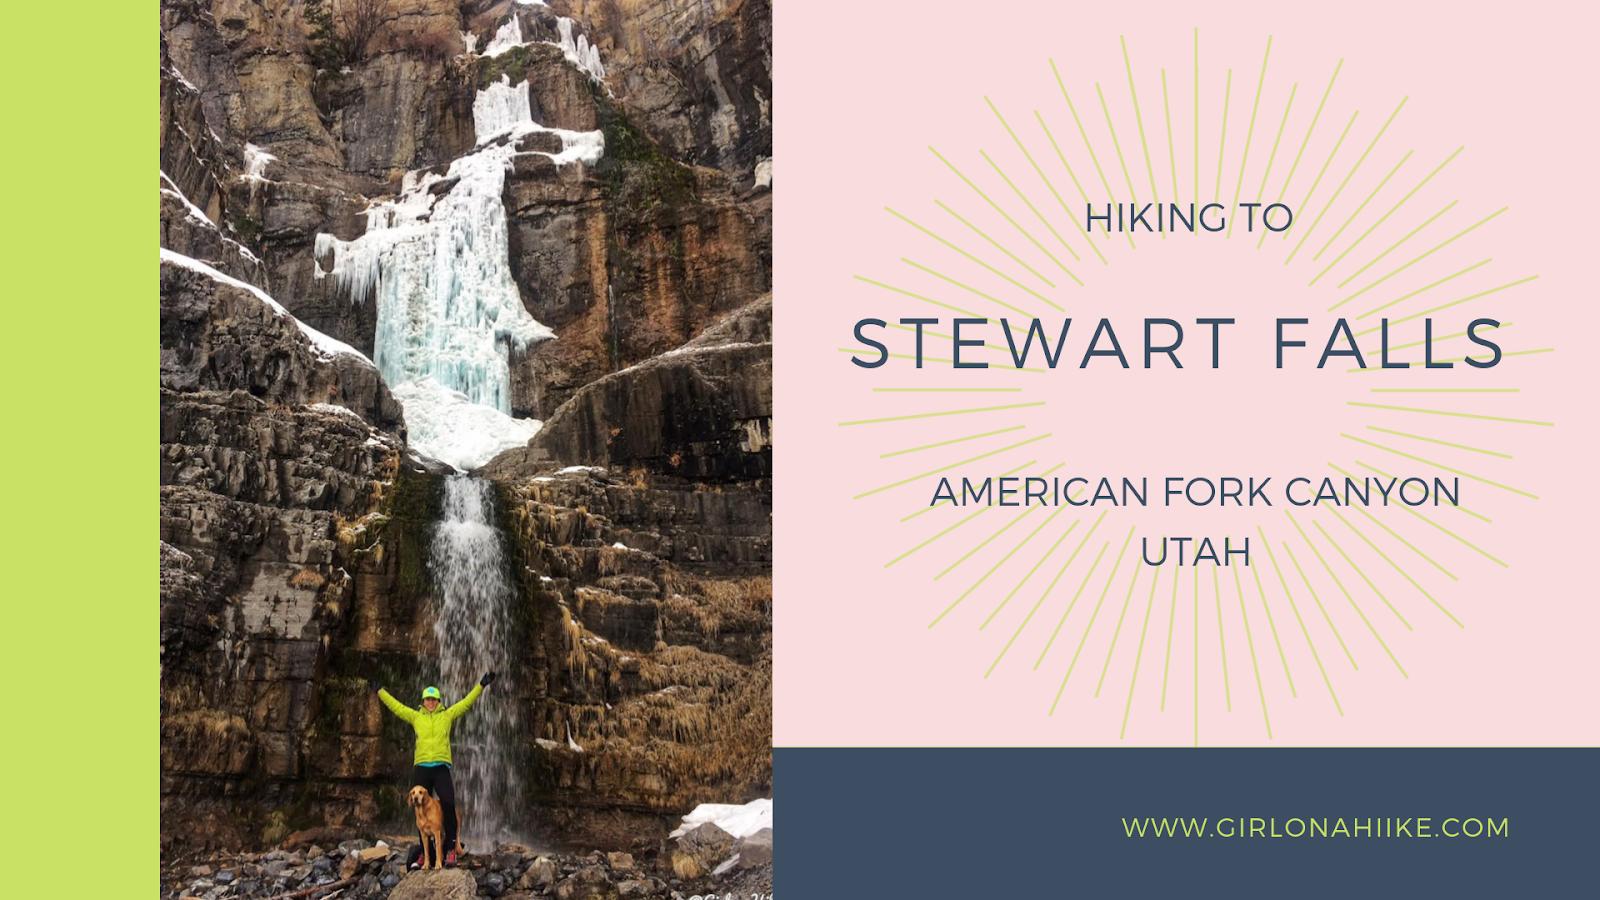 The Best Dog Friendly Waterfalls Hikes in Utah, Hike to Stewart Falls